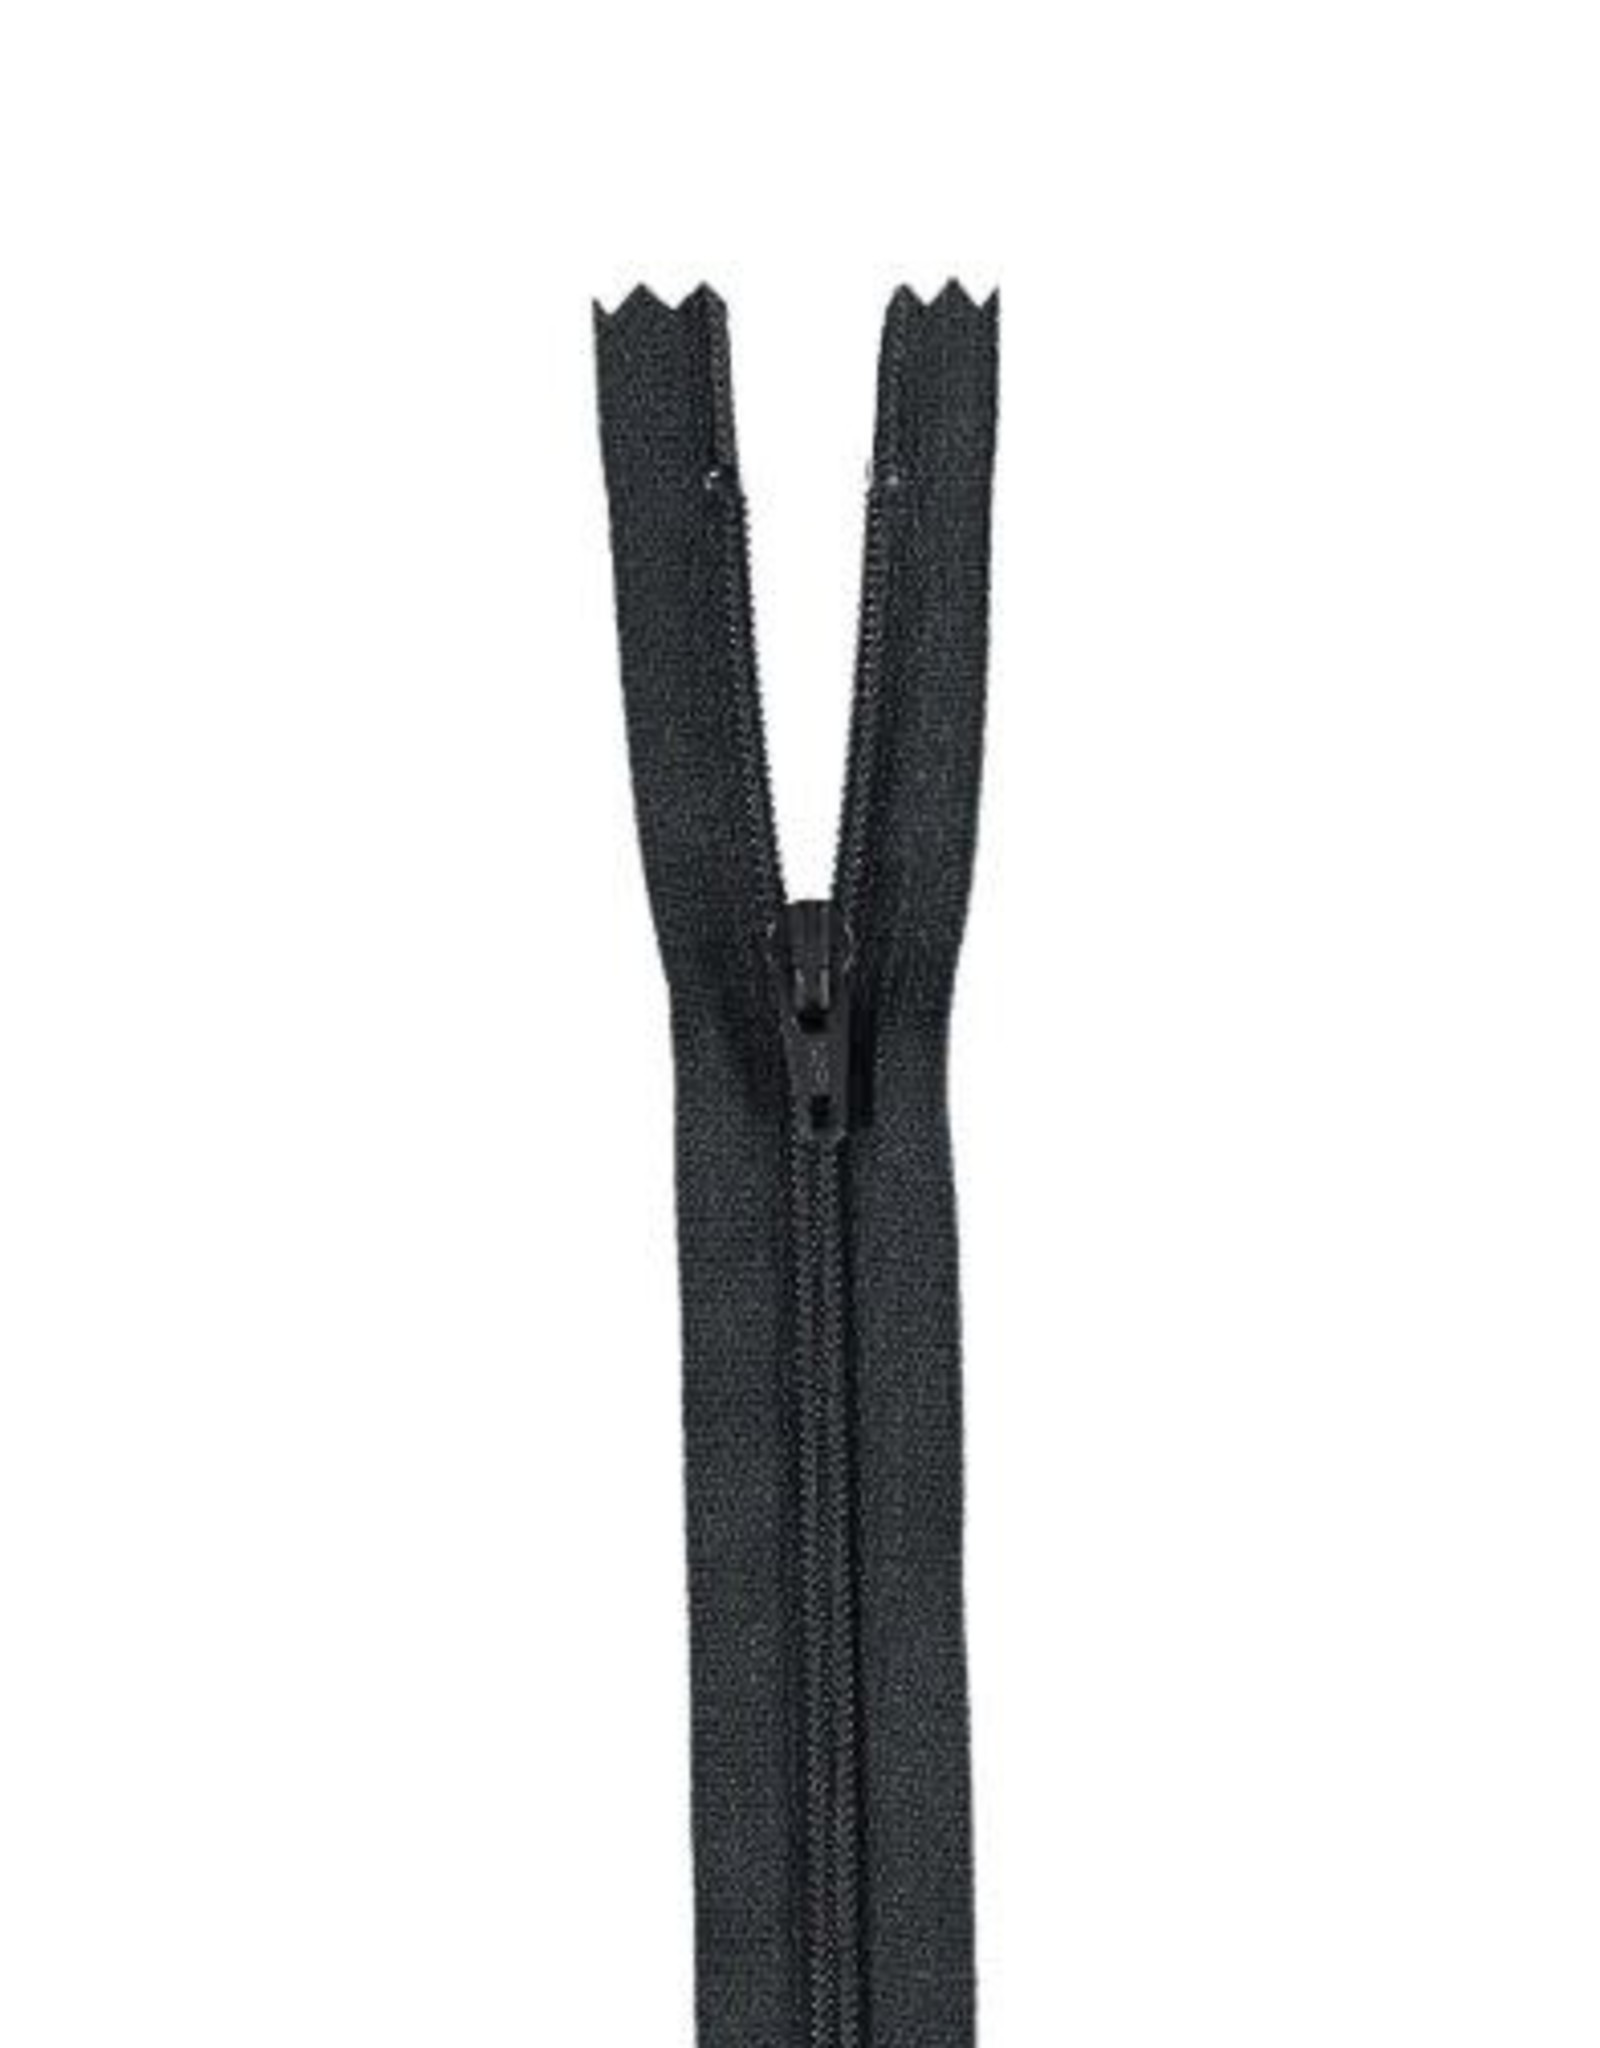 YKK Spiraalrits niet-DB 3mm antraciet 156-50cm